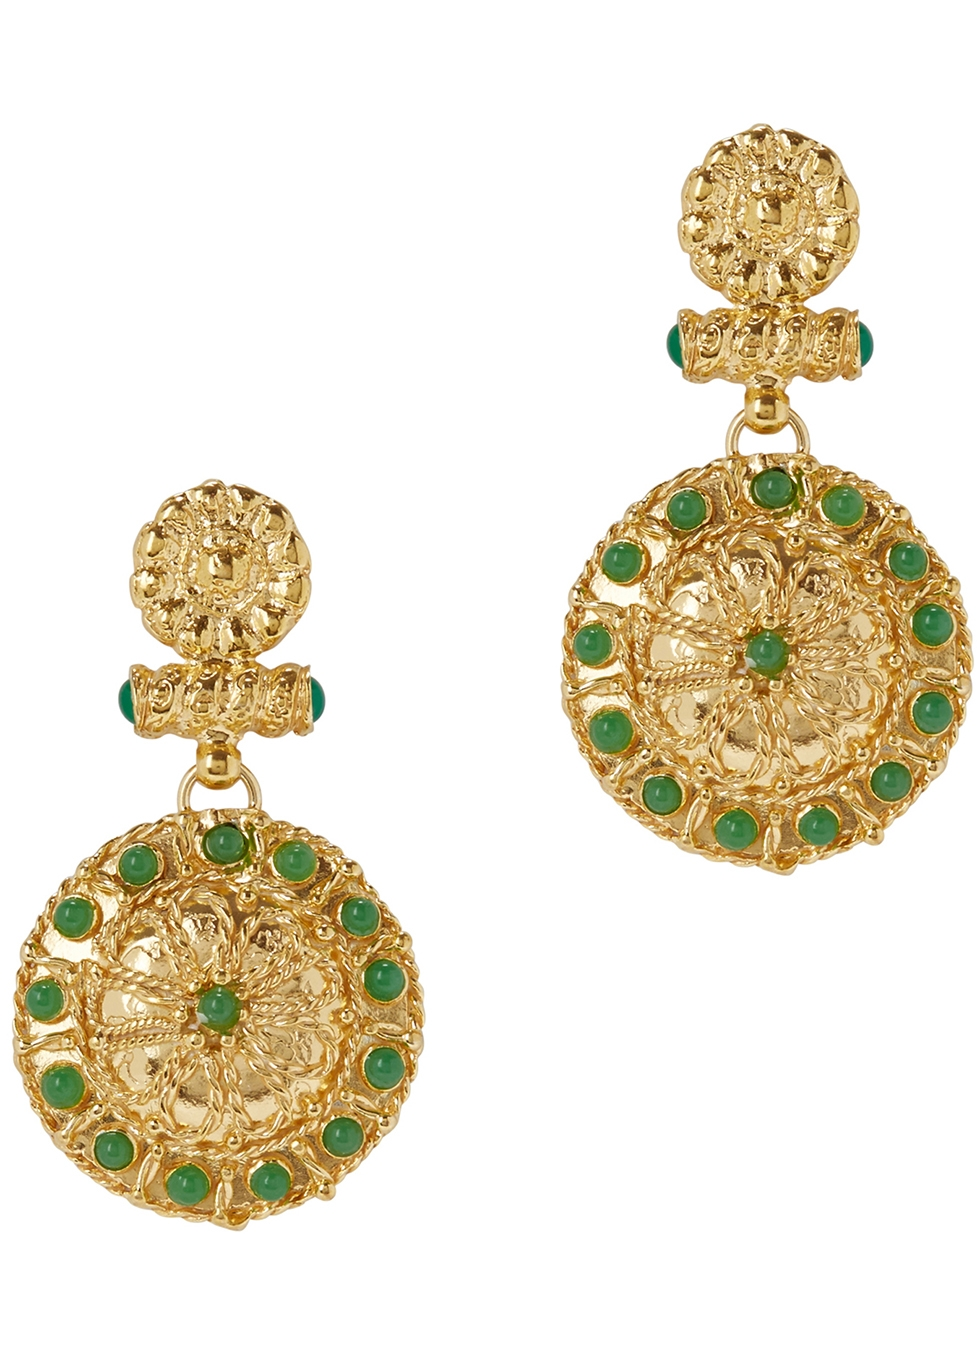 SORU JEWELLERY TREASURES 18CT GOLD-PLATED EARRINGS